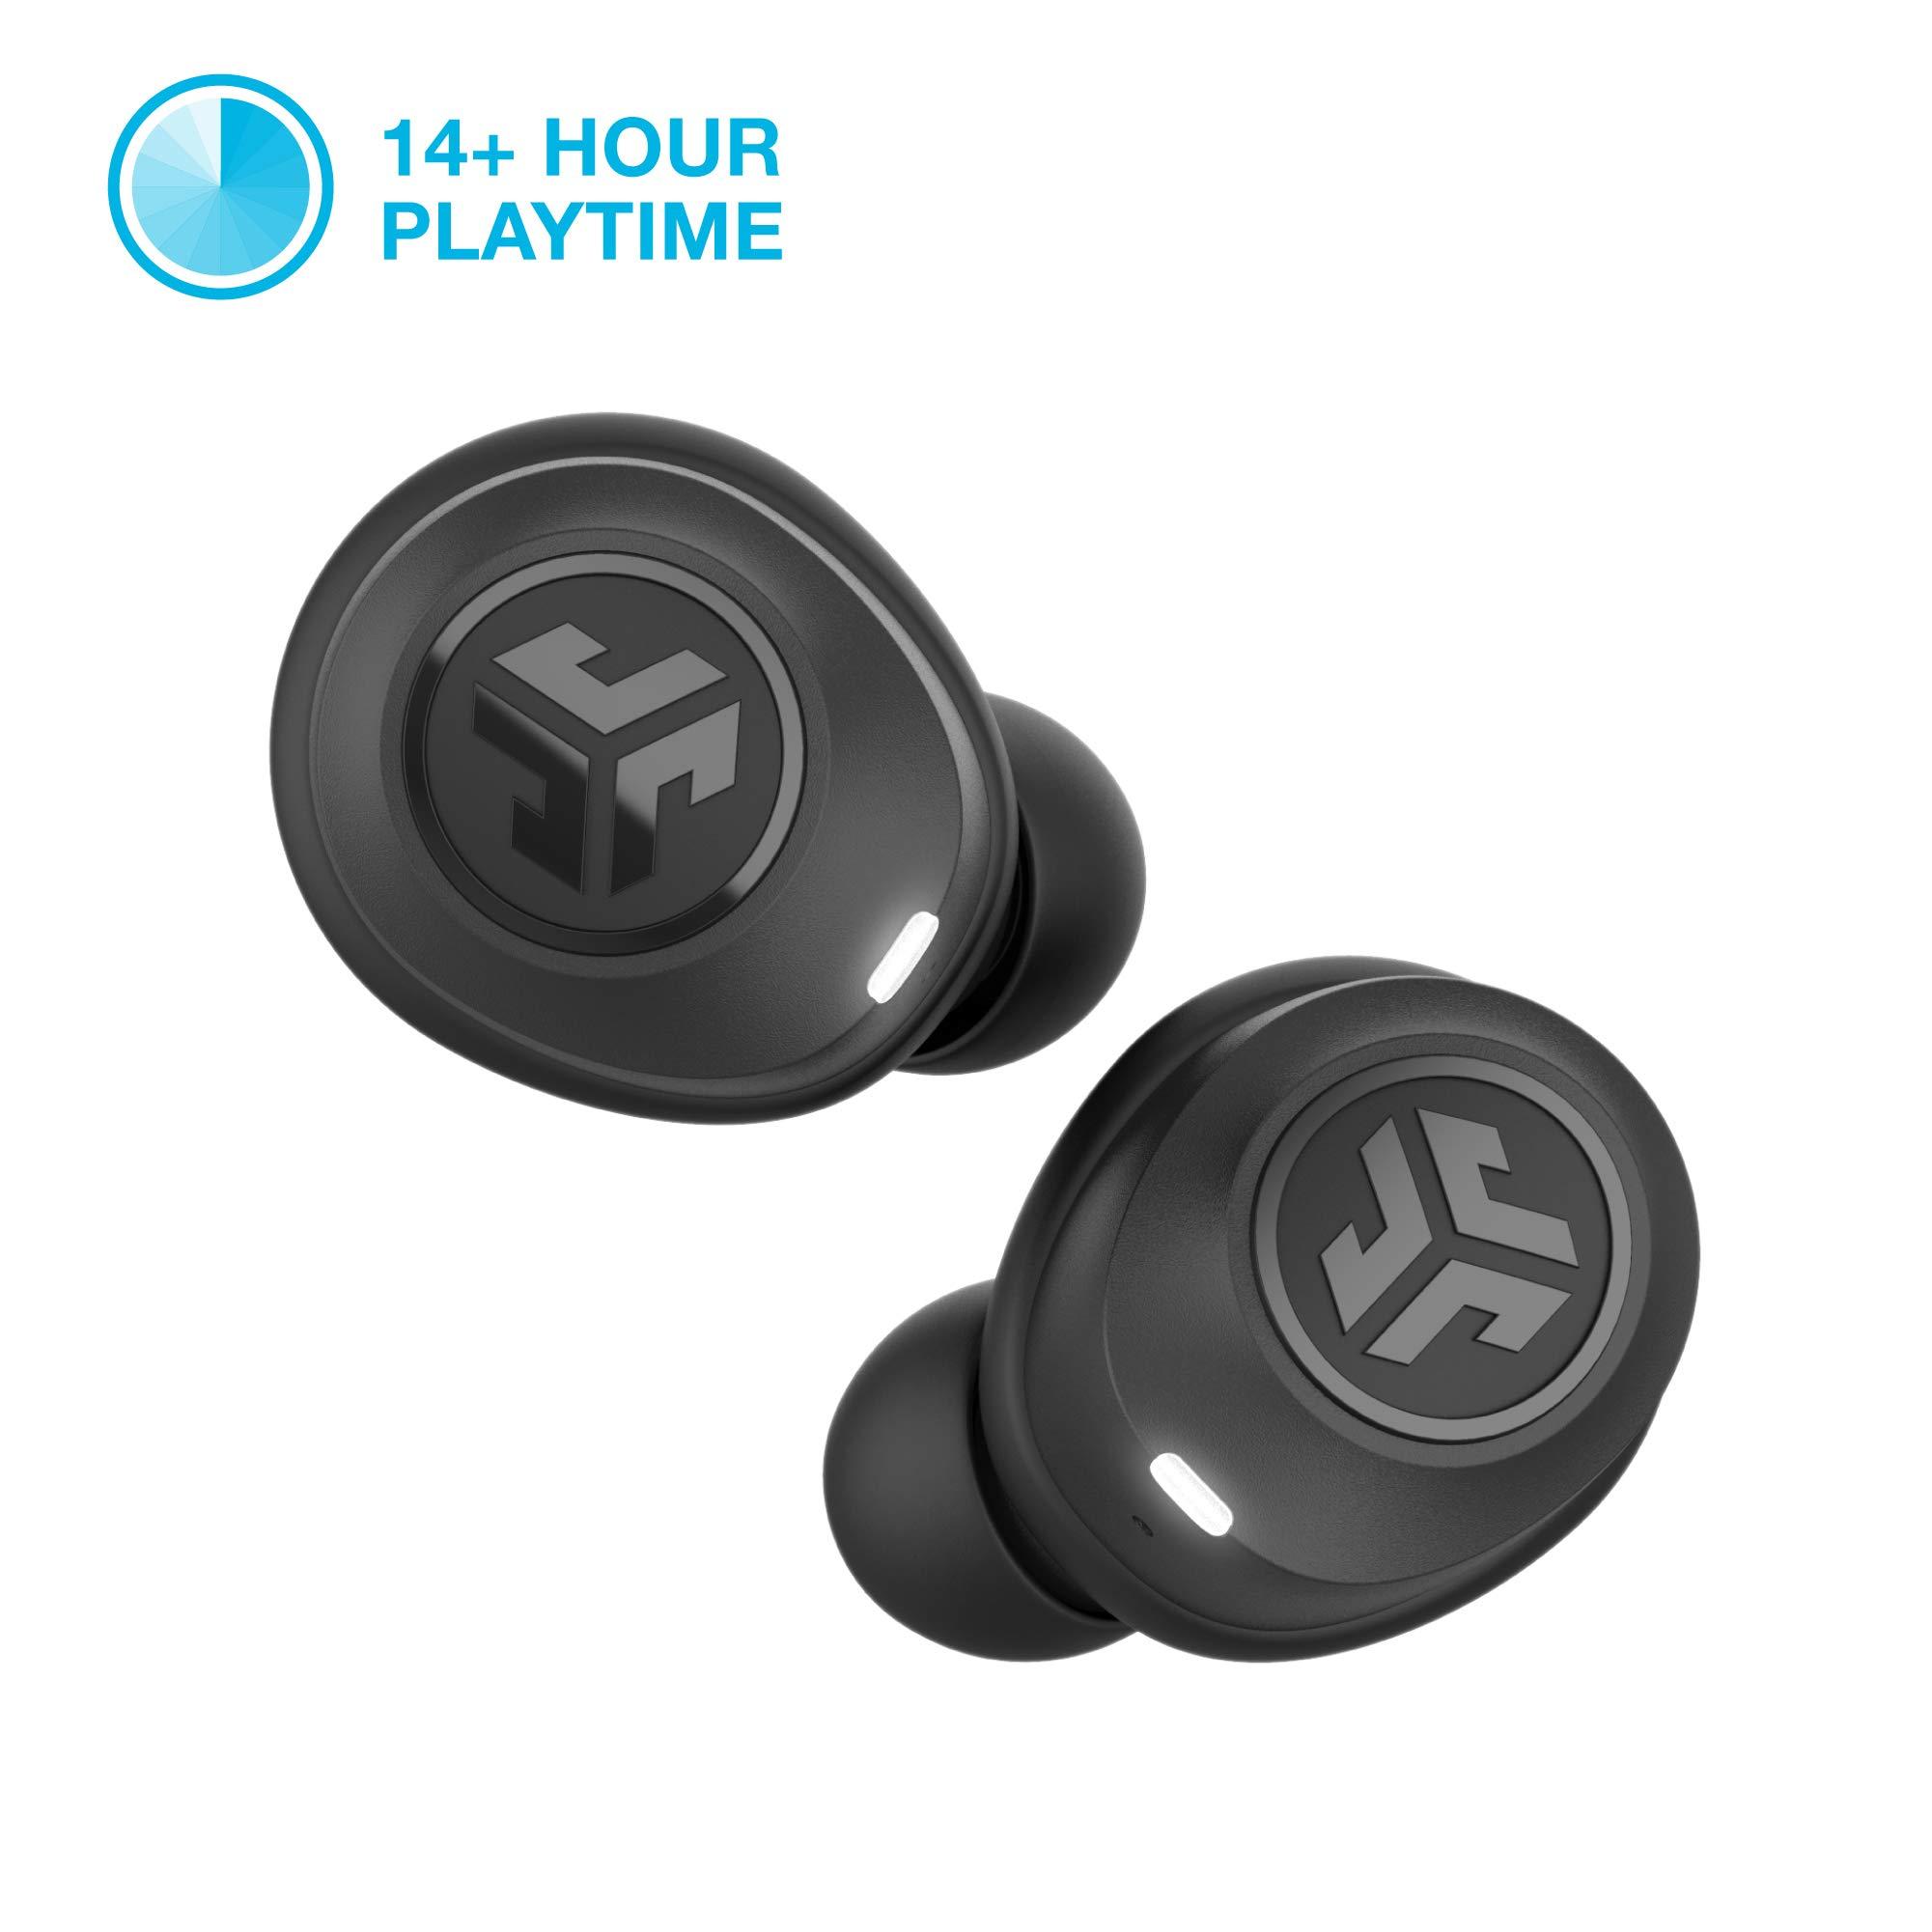 JLab Audio JBuds Air True Wireless Signature Bluetooth Earbuds + Charging Case - Black - IP55 Sweat Resistance - Bluetooth 5.0 Connection - 3 EQ Sound Settings: JLab Signature, Balanced, Bass Boost by JLAB